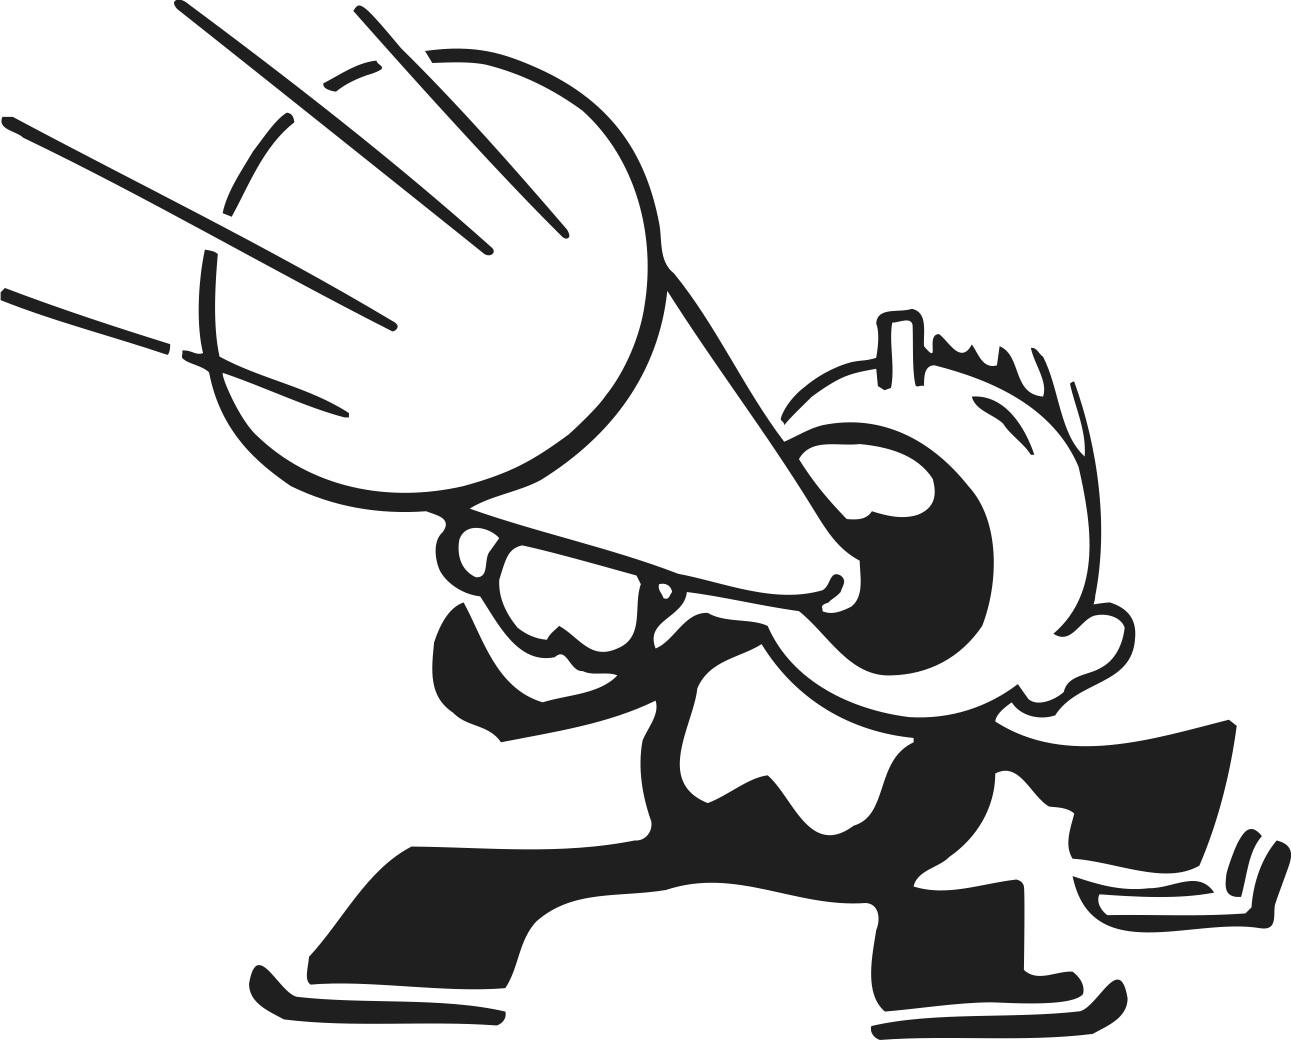 Clipart megaphone tumundografico 3